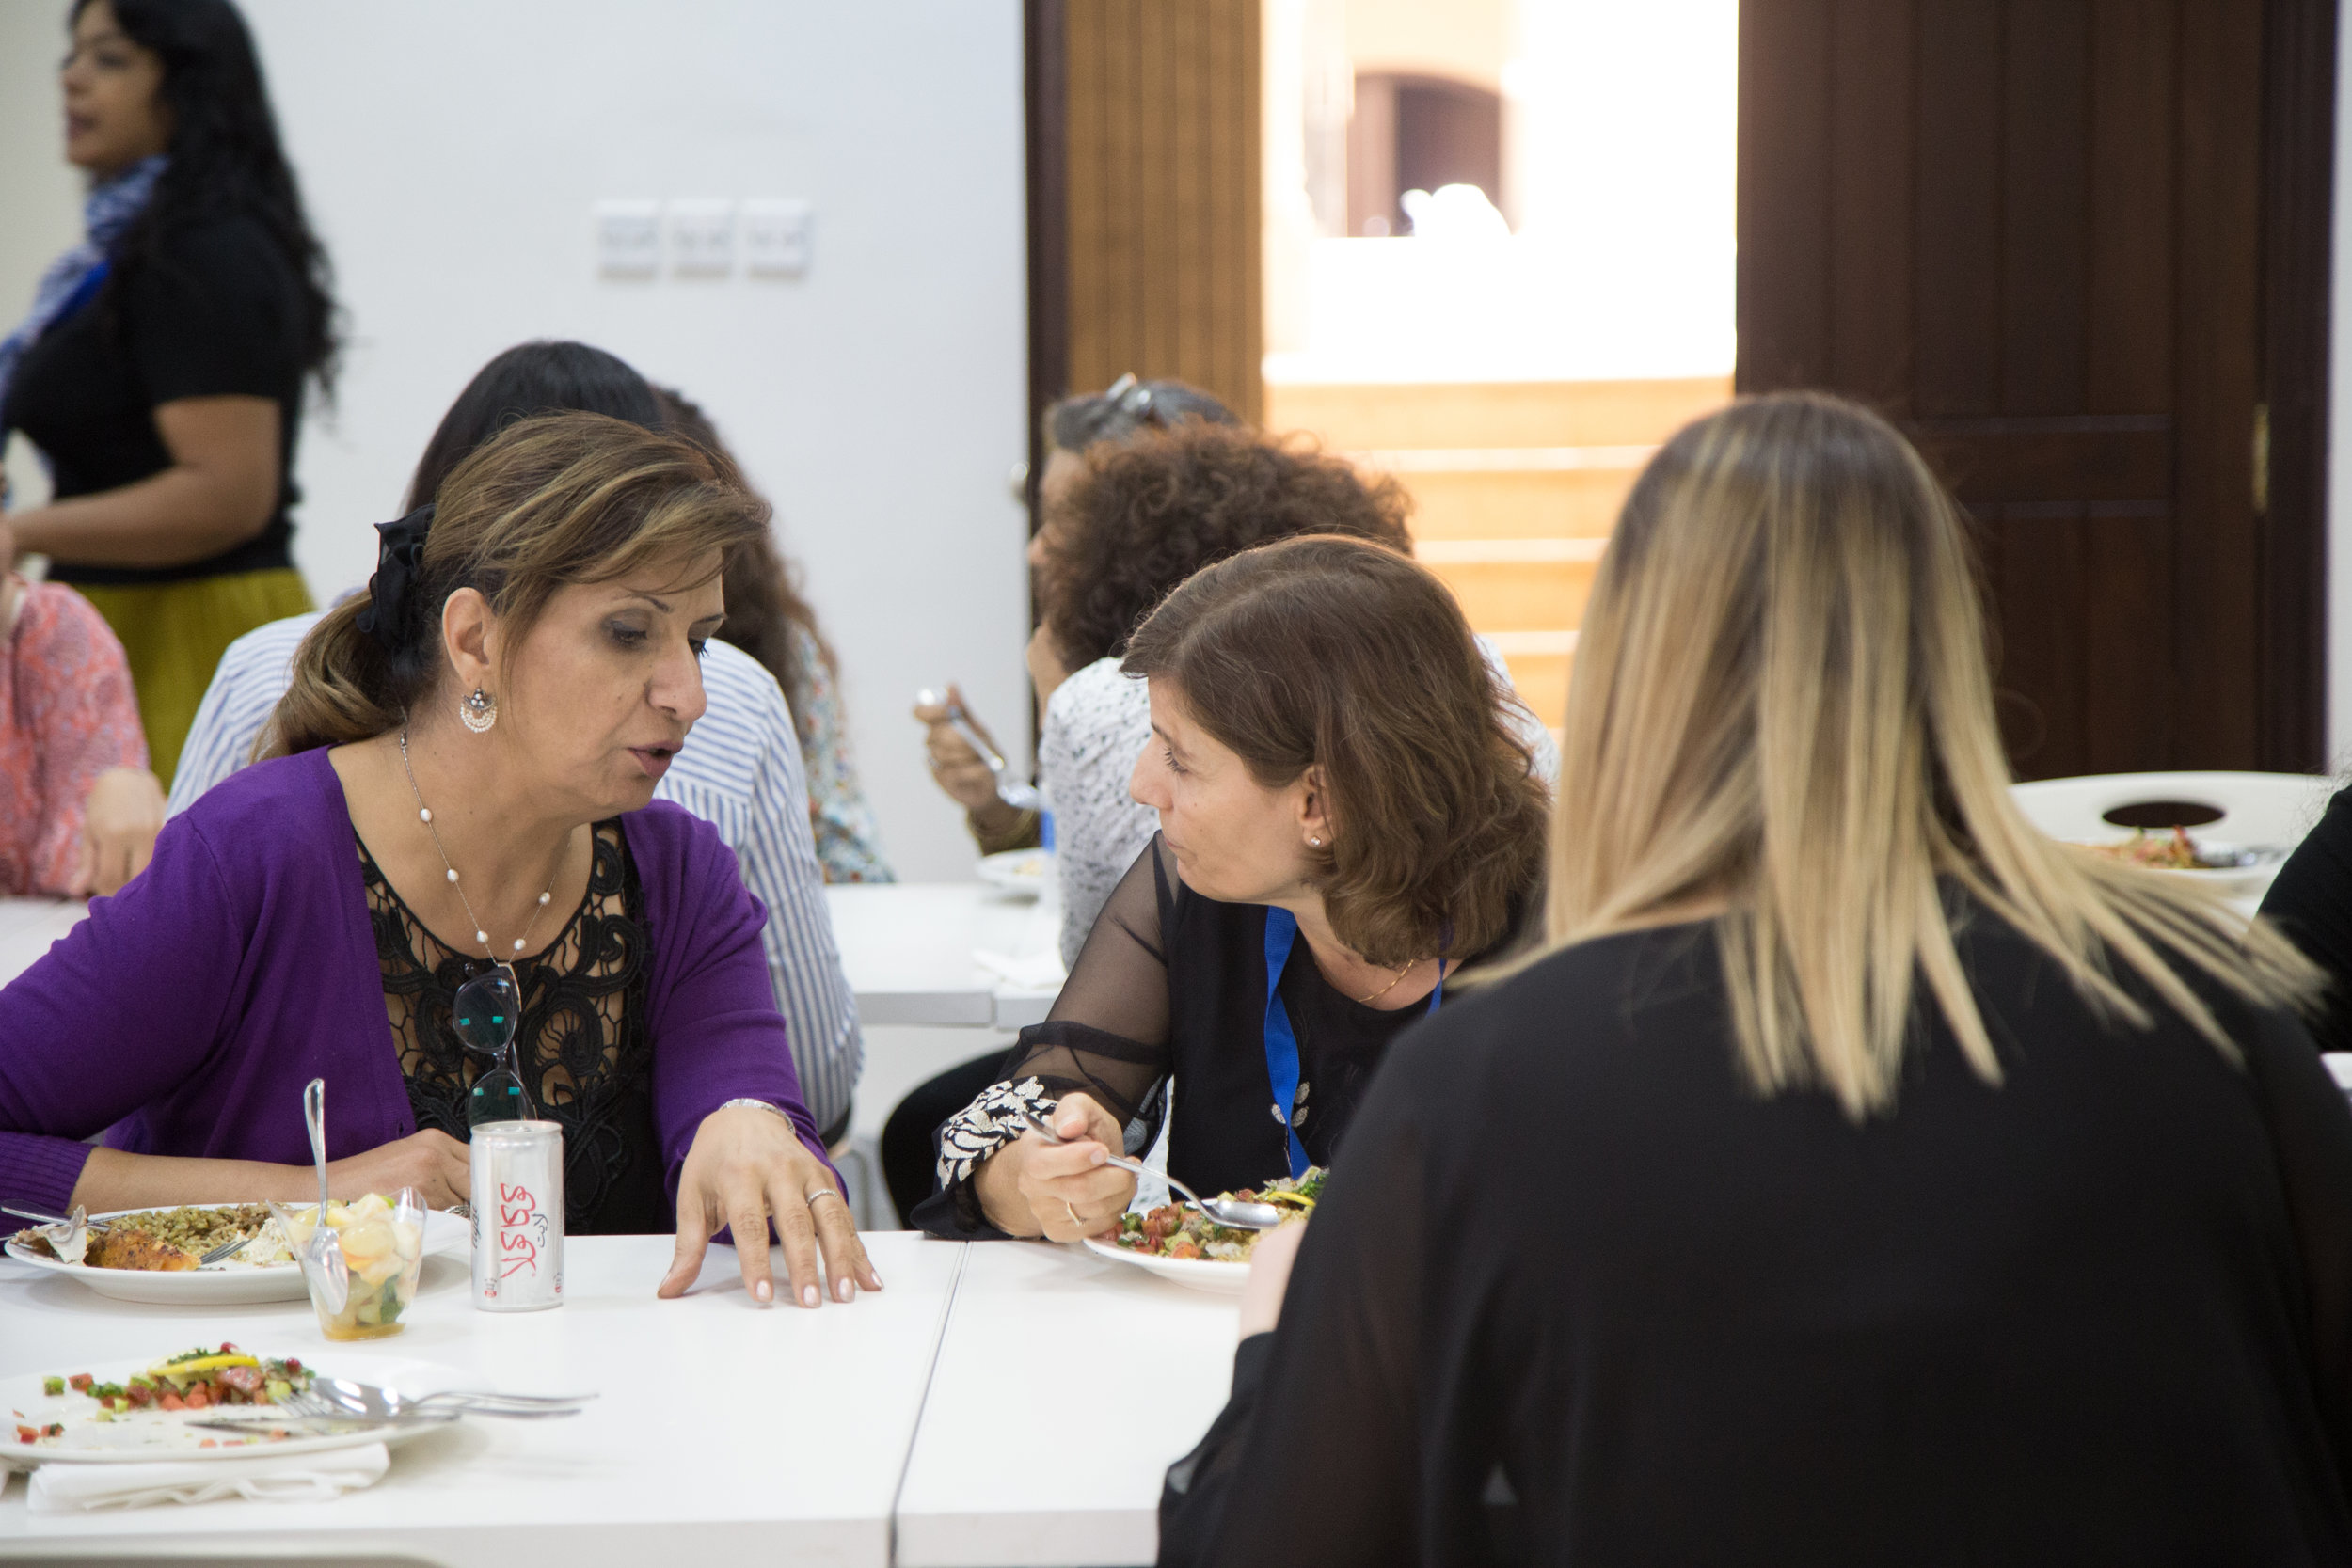 Nadera Shalhoub Kevorkian, Shahla Talebi